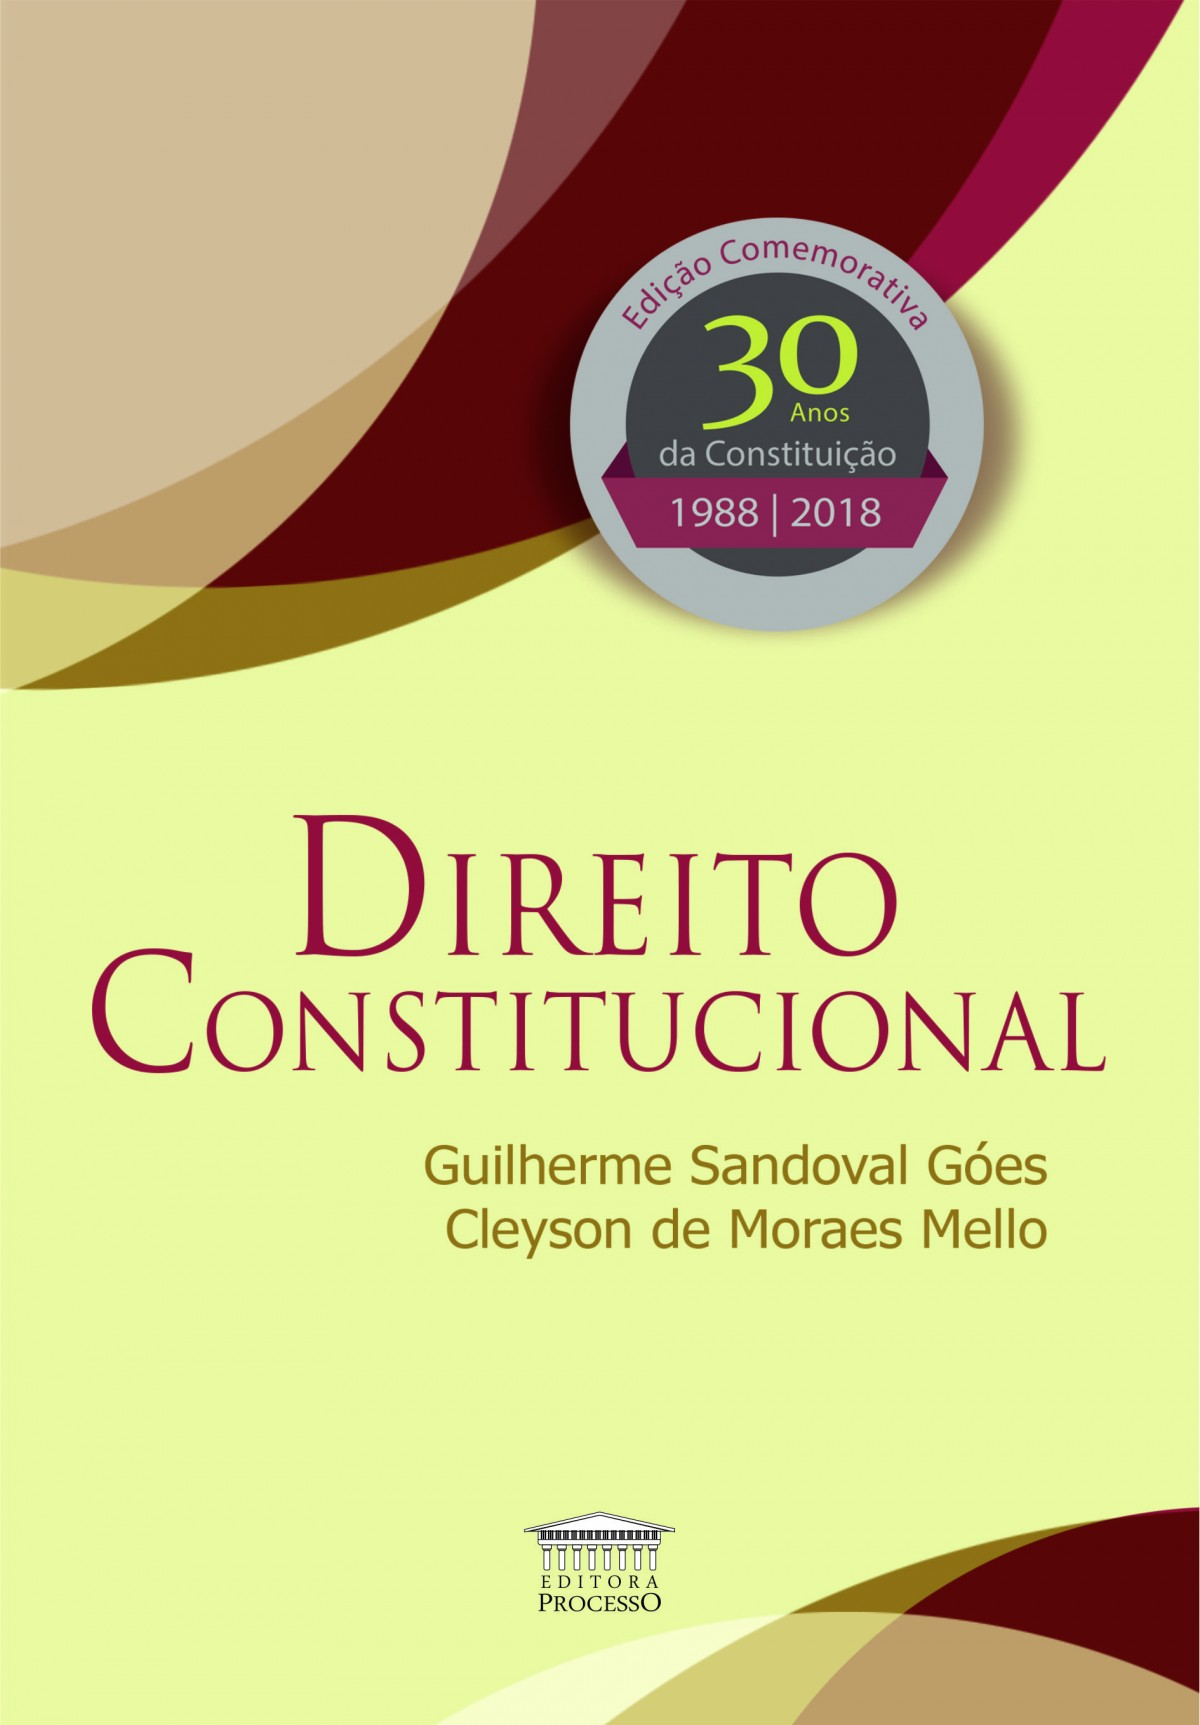 Foto 1 - Direito Constitucional